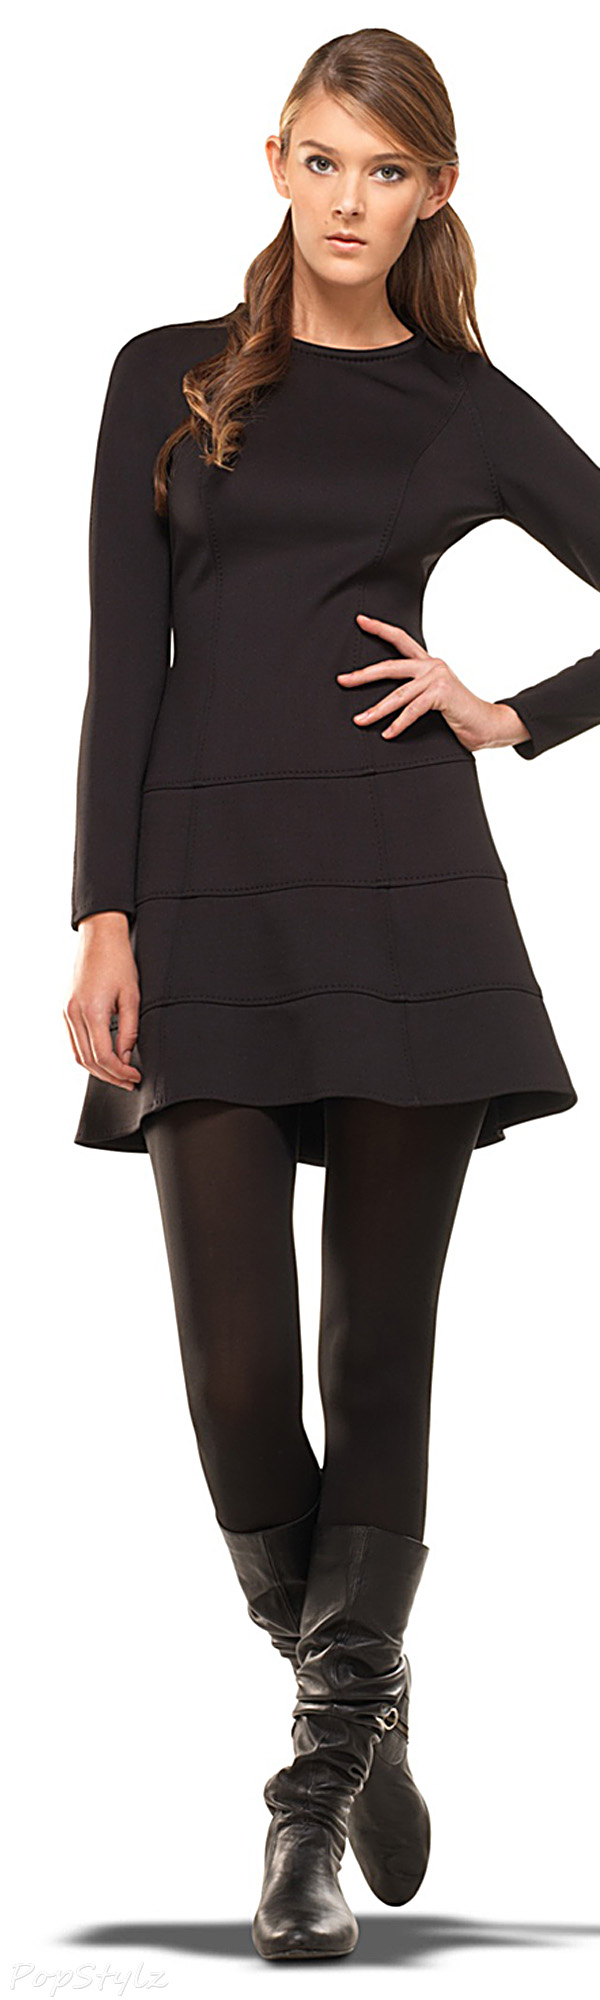 MAXSTUDIO Black Long Sleeve Dress